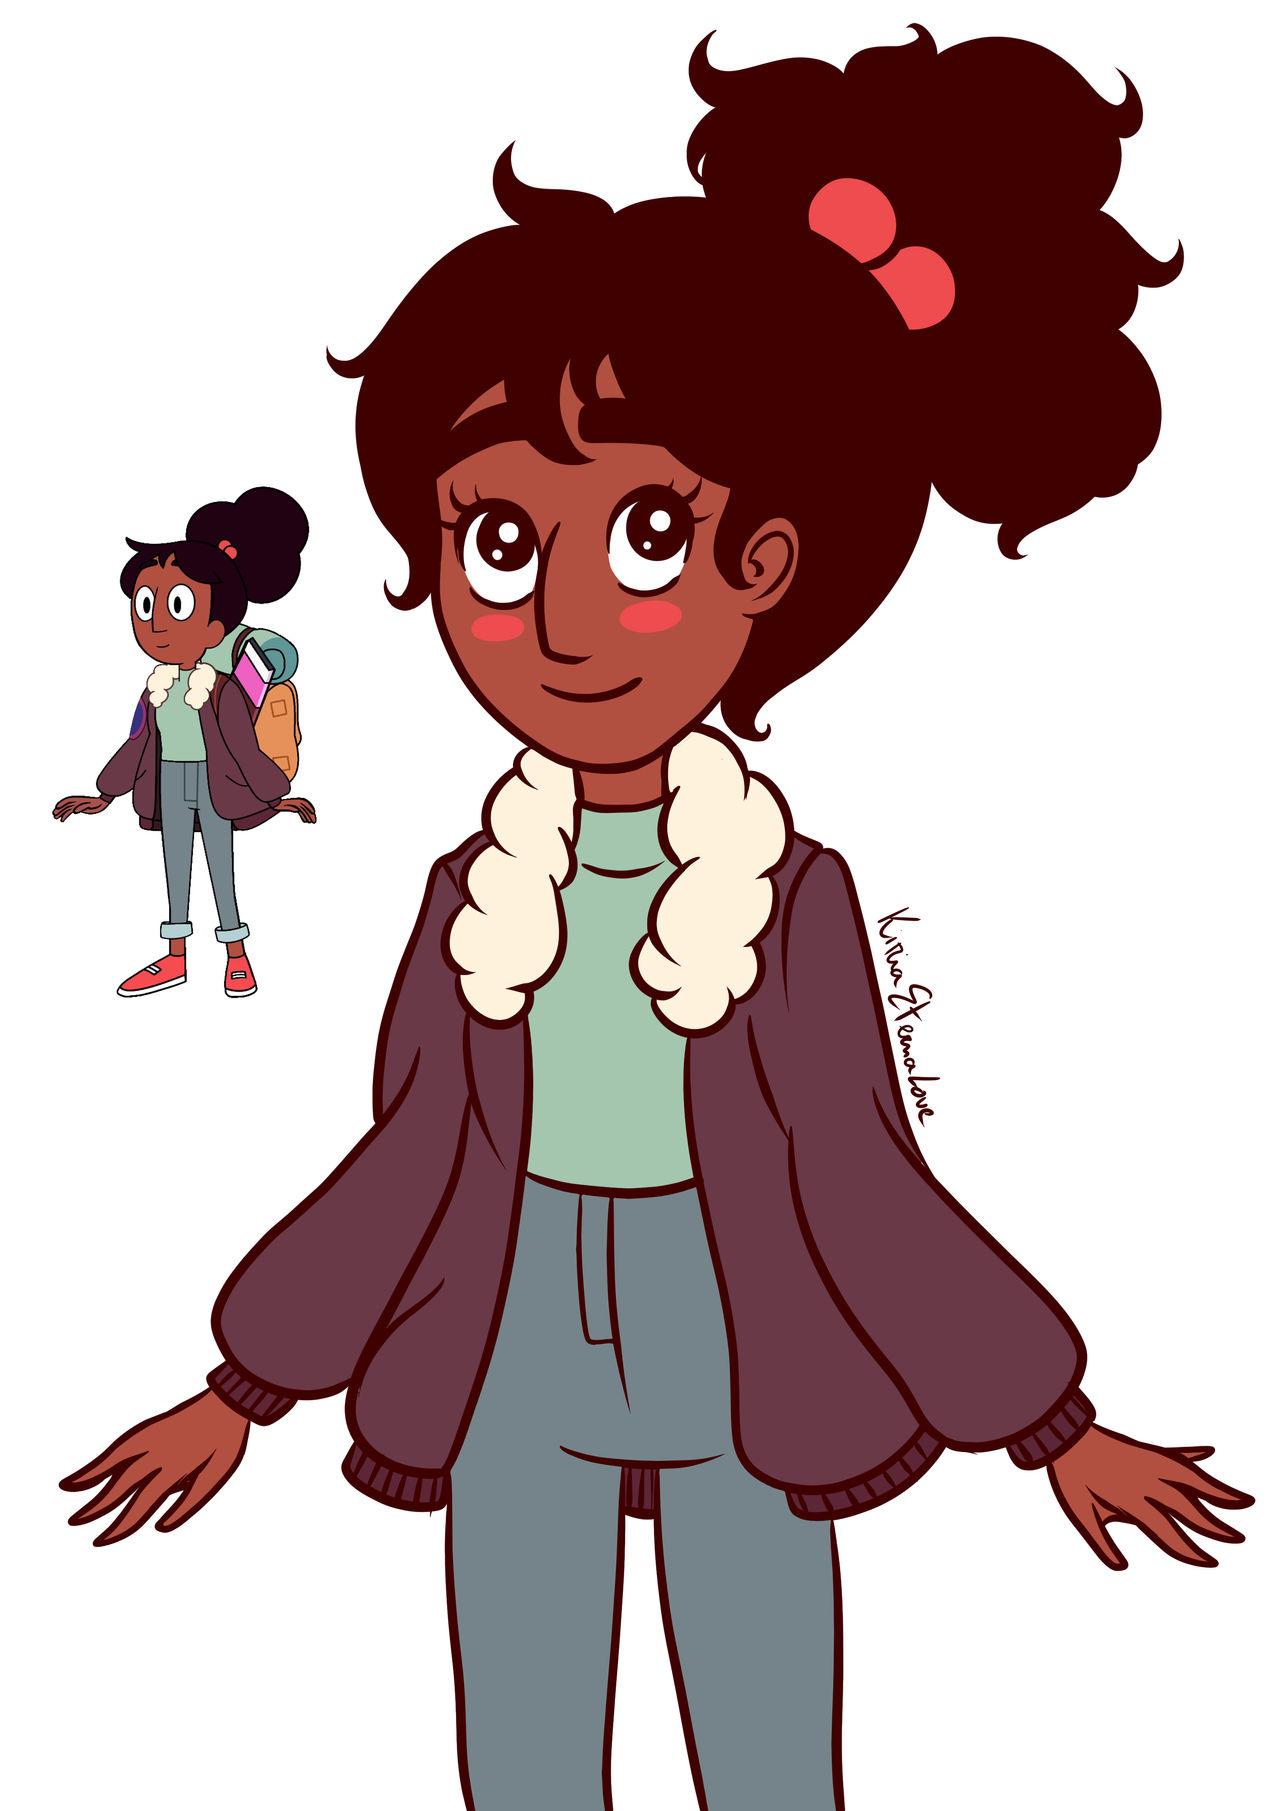 Connie with my style by KiriaEternaLove